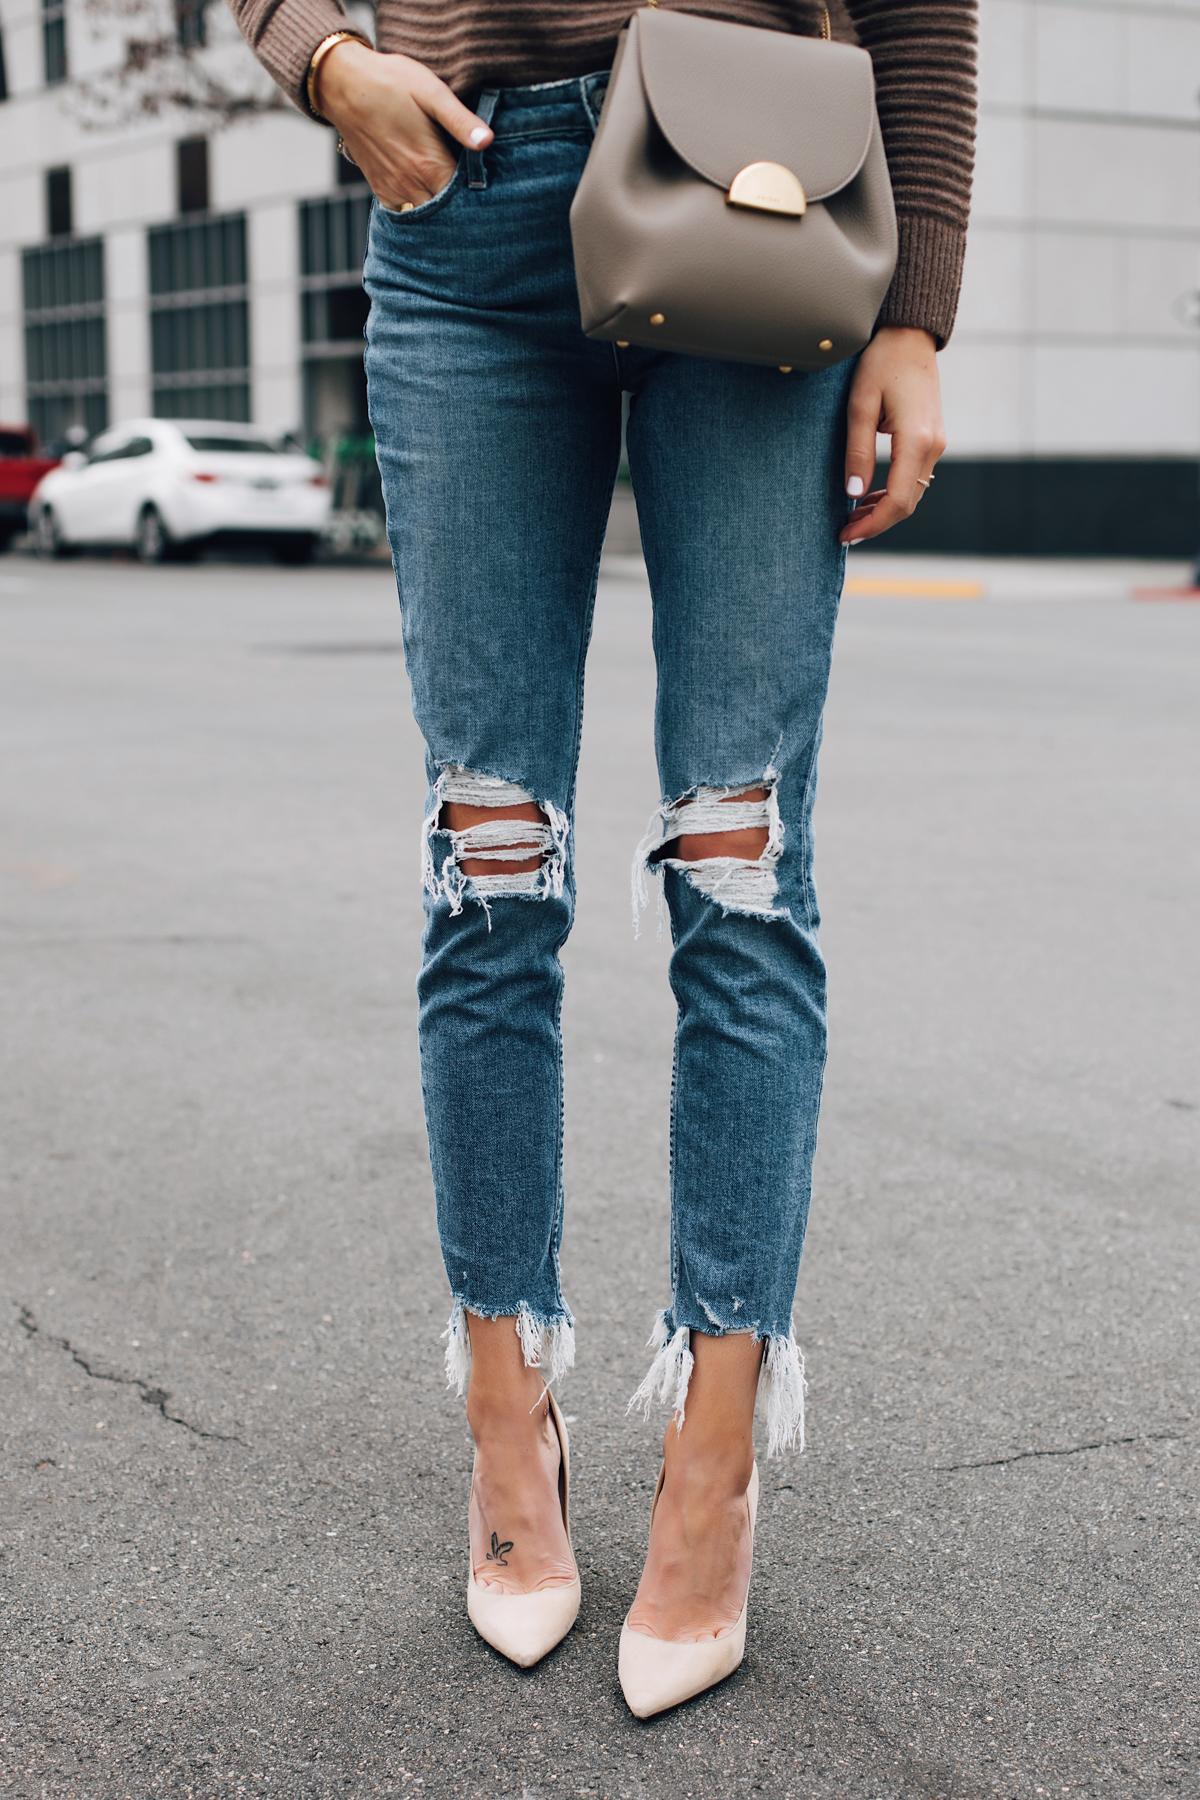 Woman Wearing Paige Ripped Skinny Jeans Nude Pumps Polene Grey Handbag Fashion Jackson San Diego Fashion Blogger Street Style